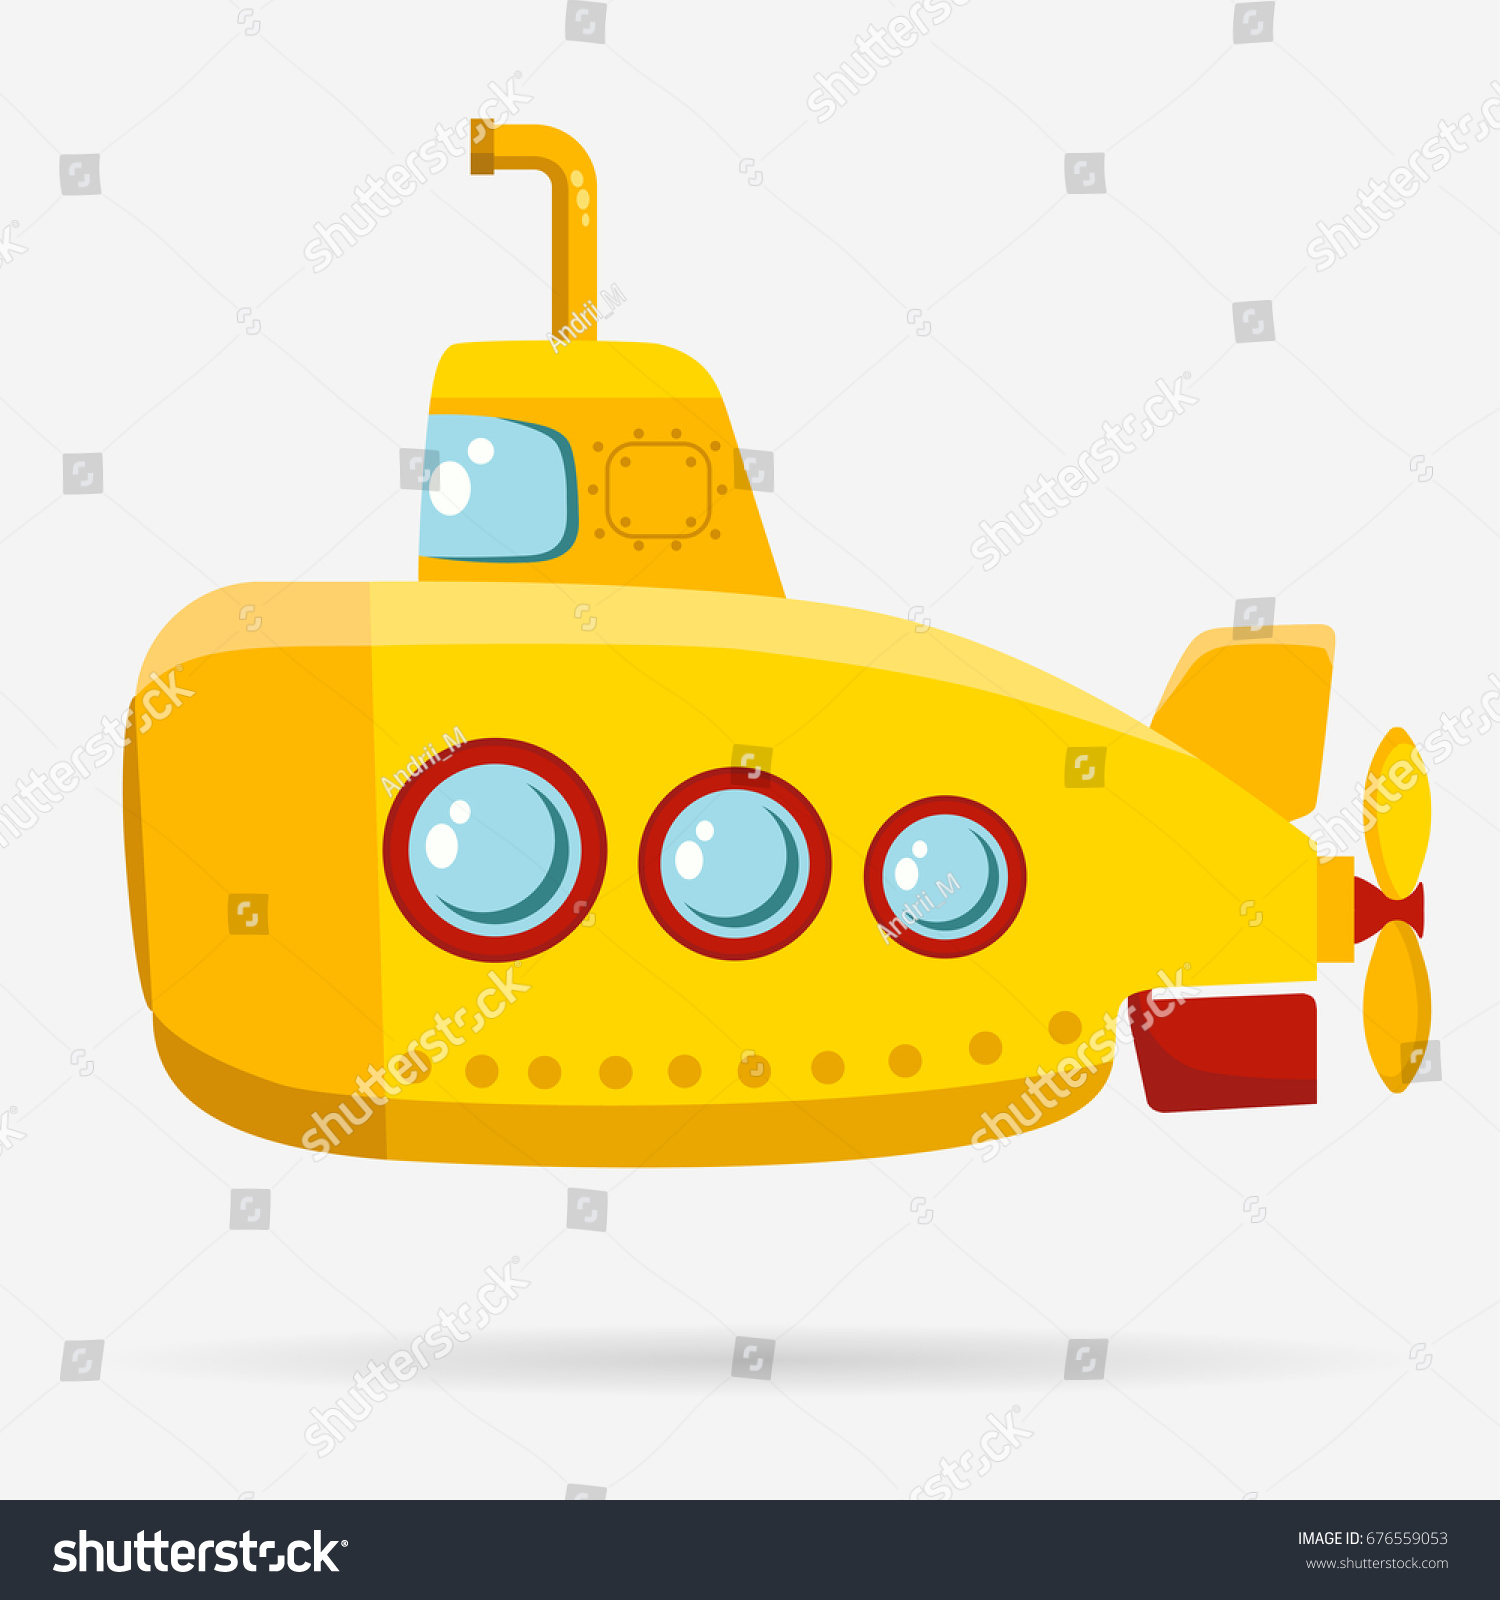 Yellow Submarine Periscope Bathyscaphe Cartoon Underwater ...